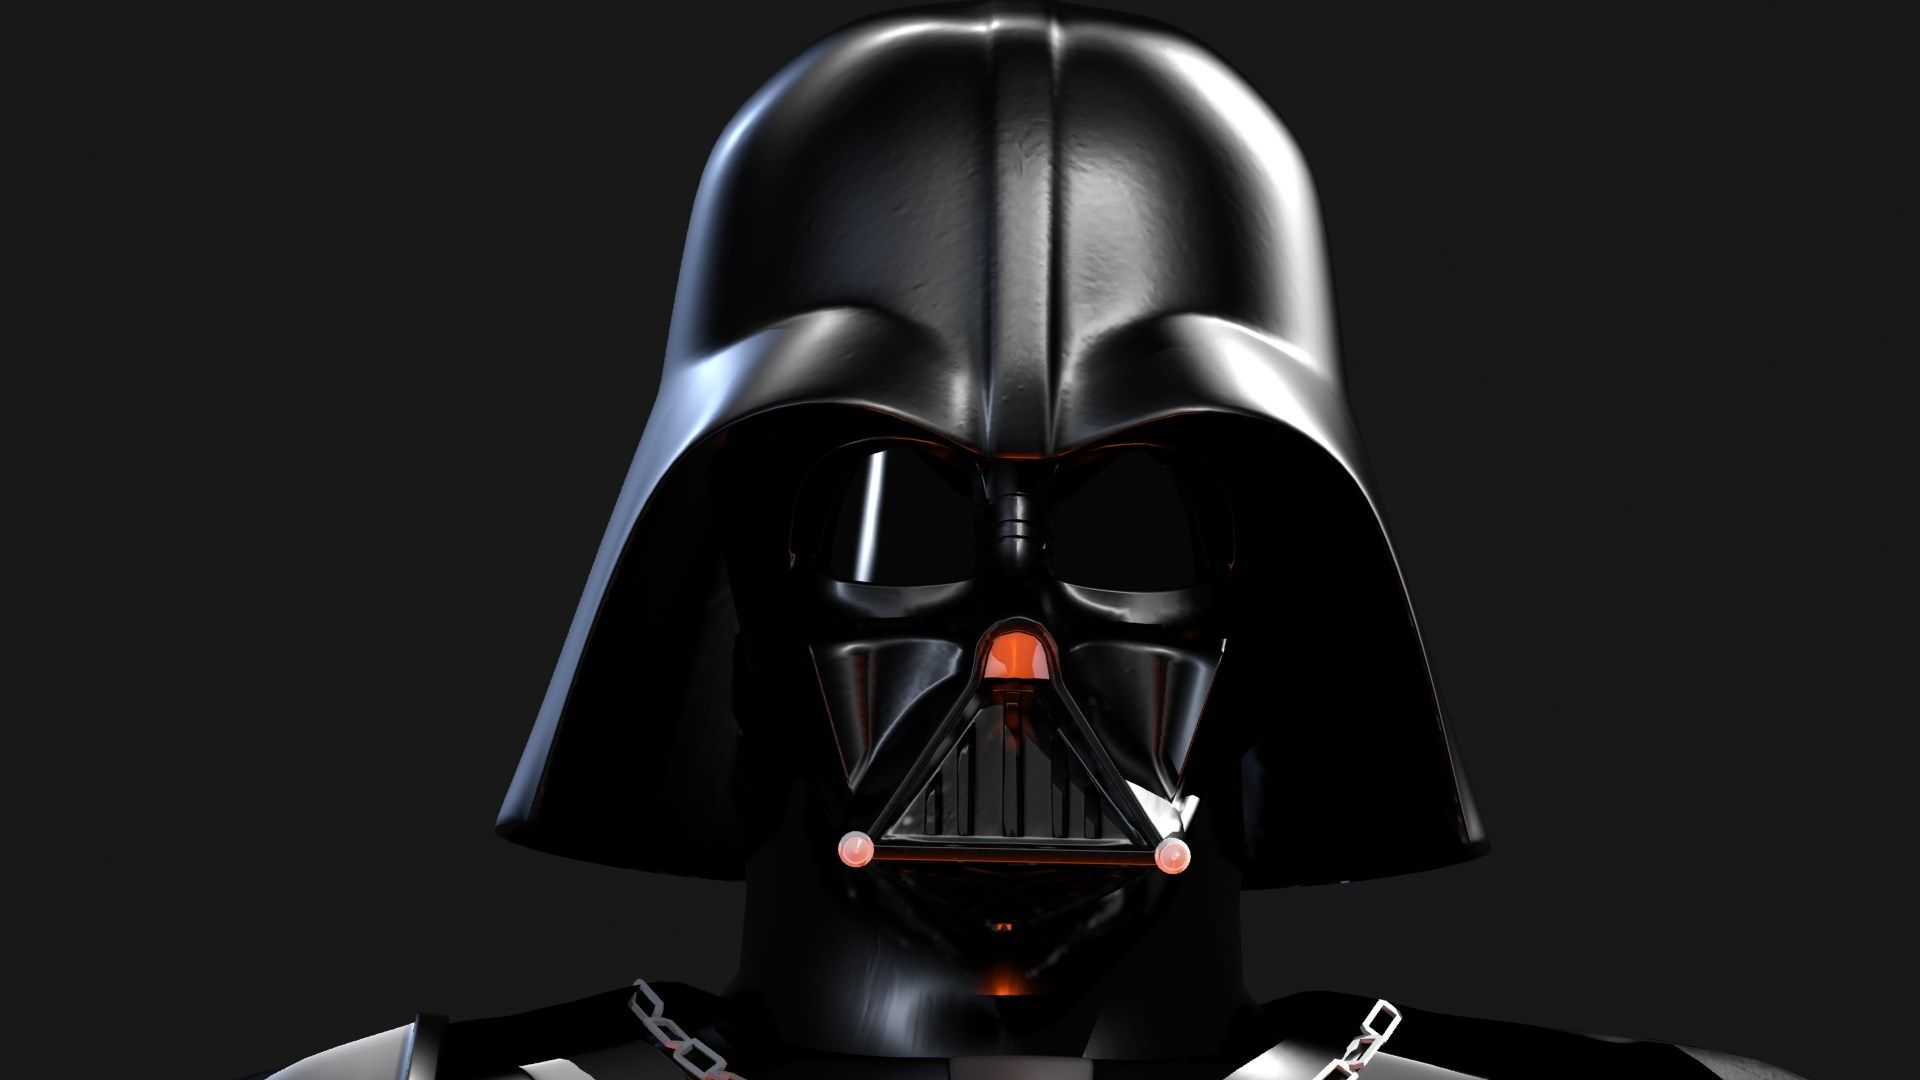 Star Wars Artwork Darth Vader Wallpapers HD Desktop And